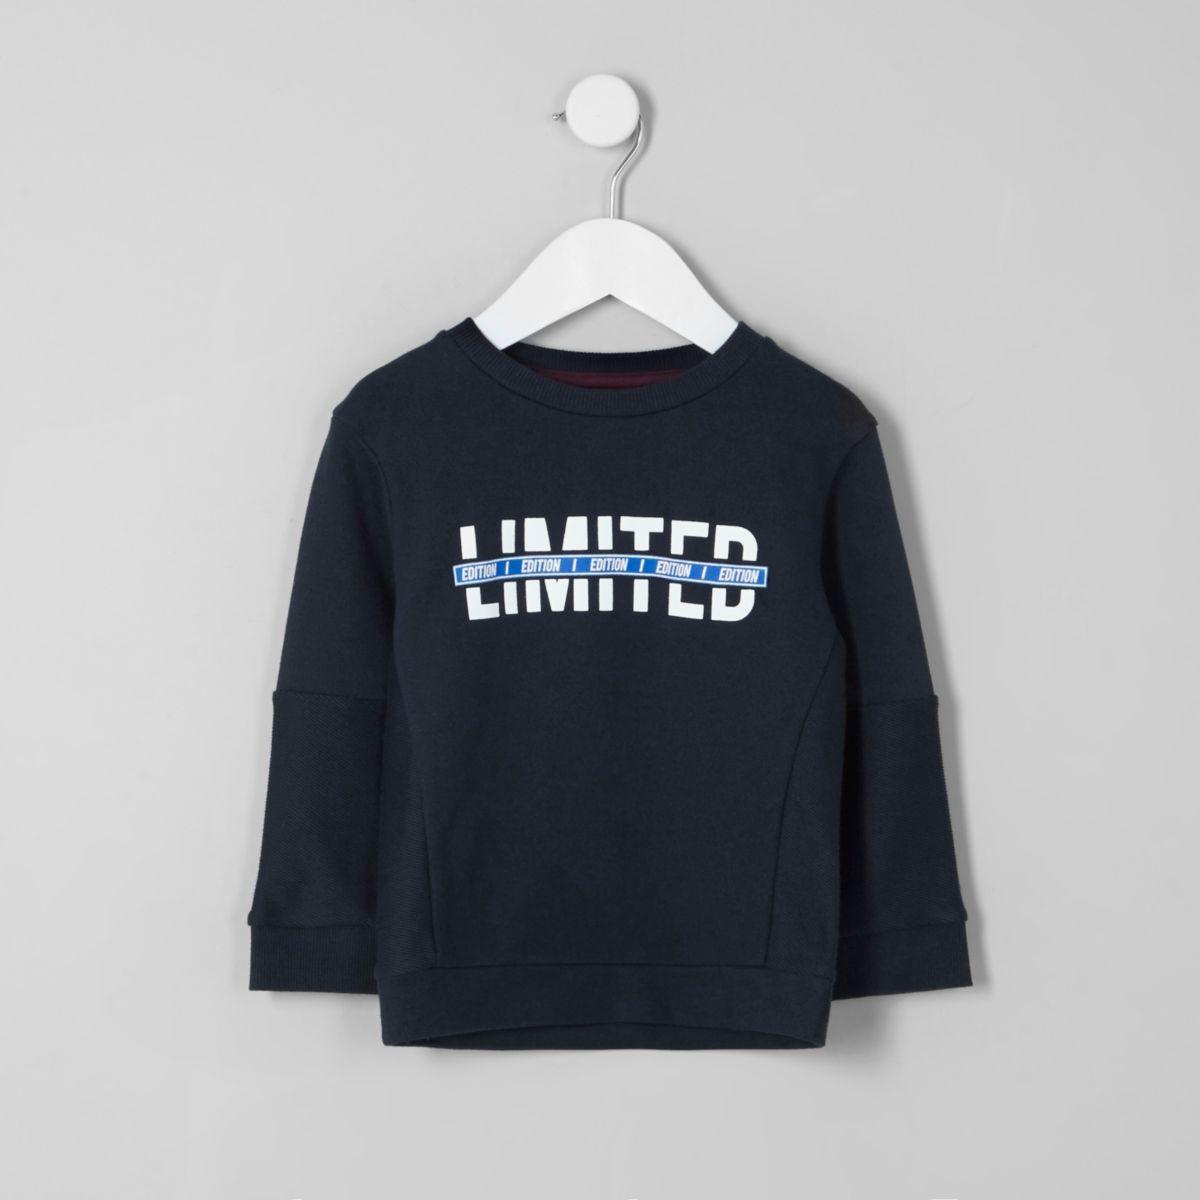 Mini boys 'limited edition' sweatshirt